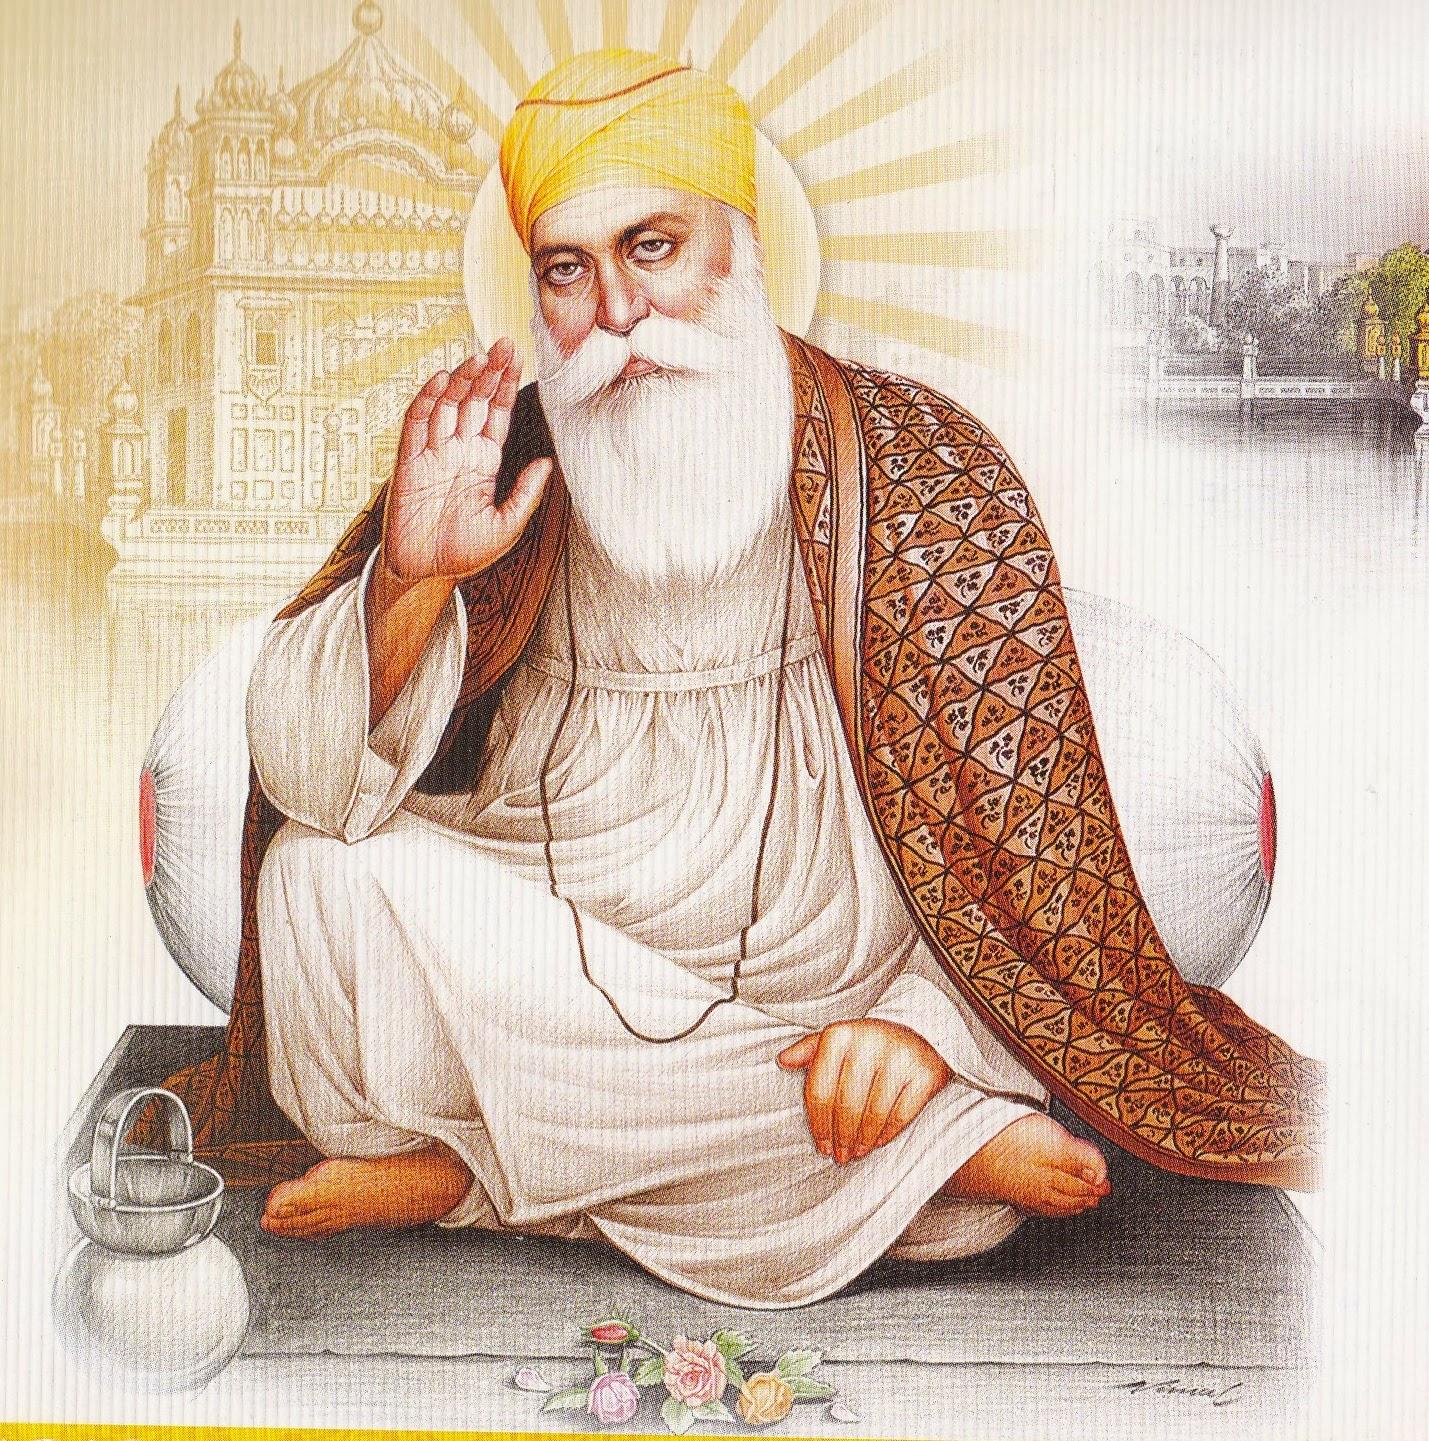 sri guru nanak dev ji essay in punjabi language